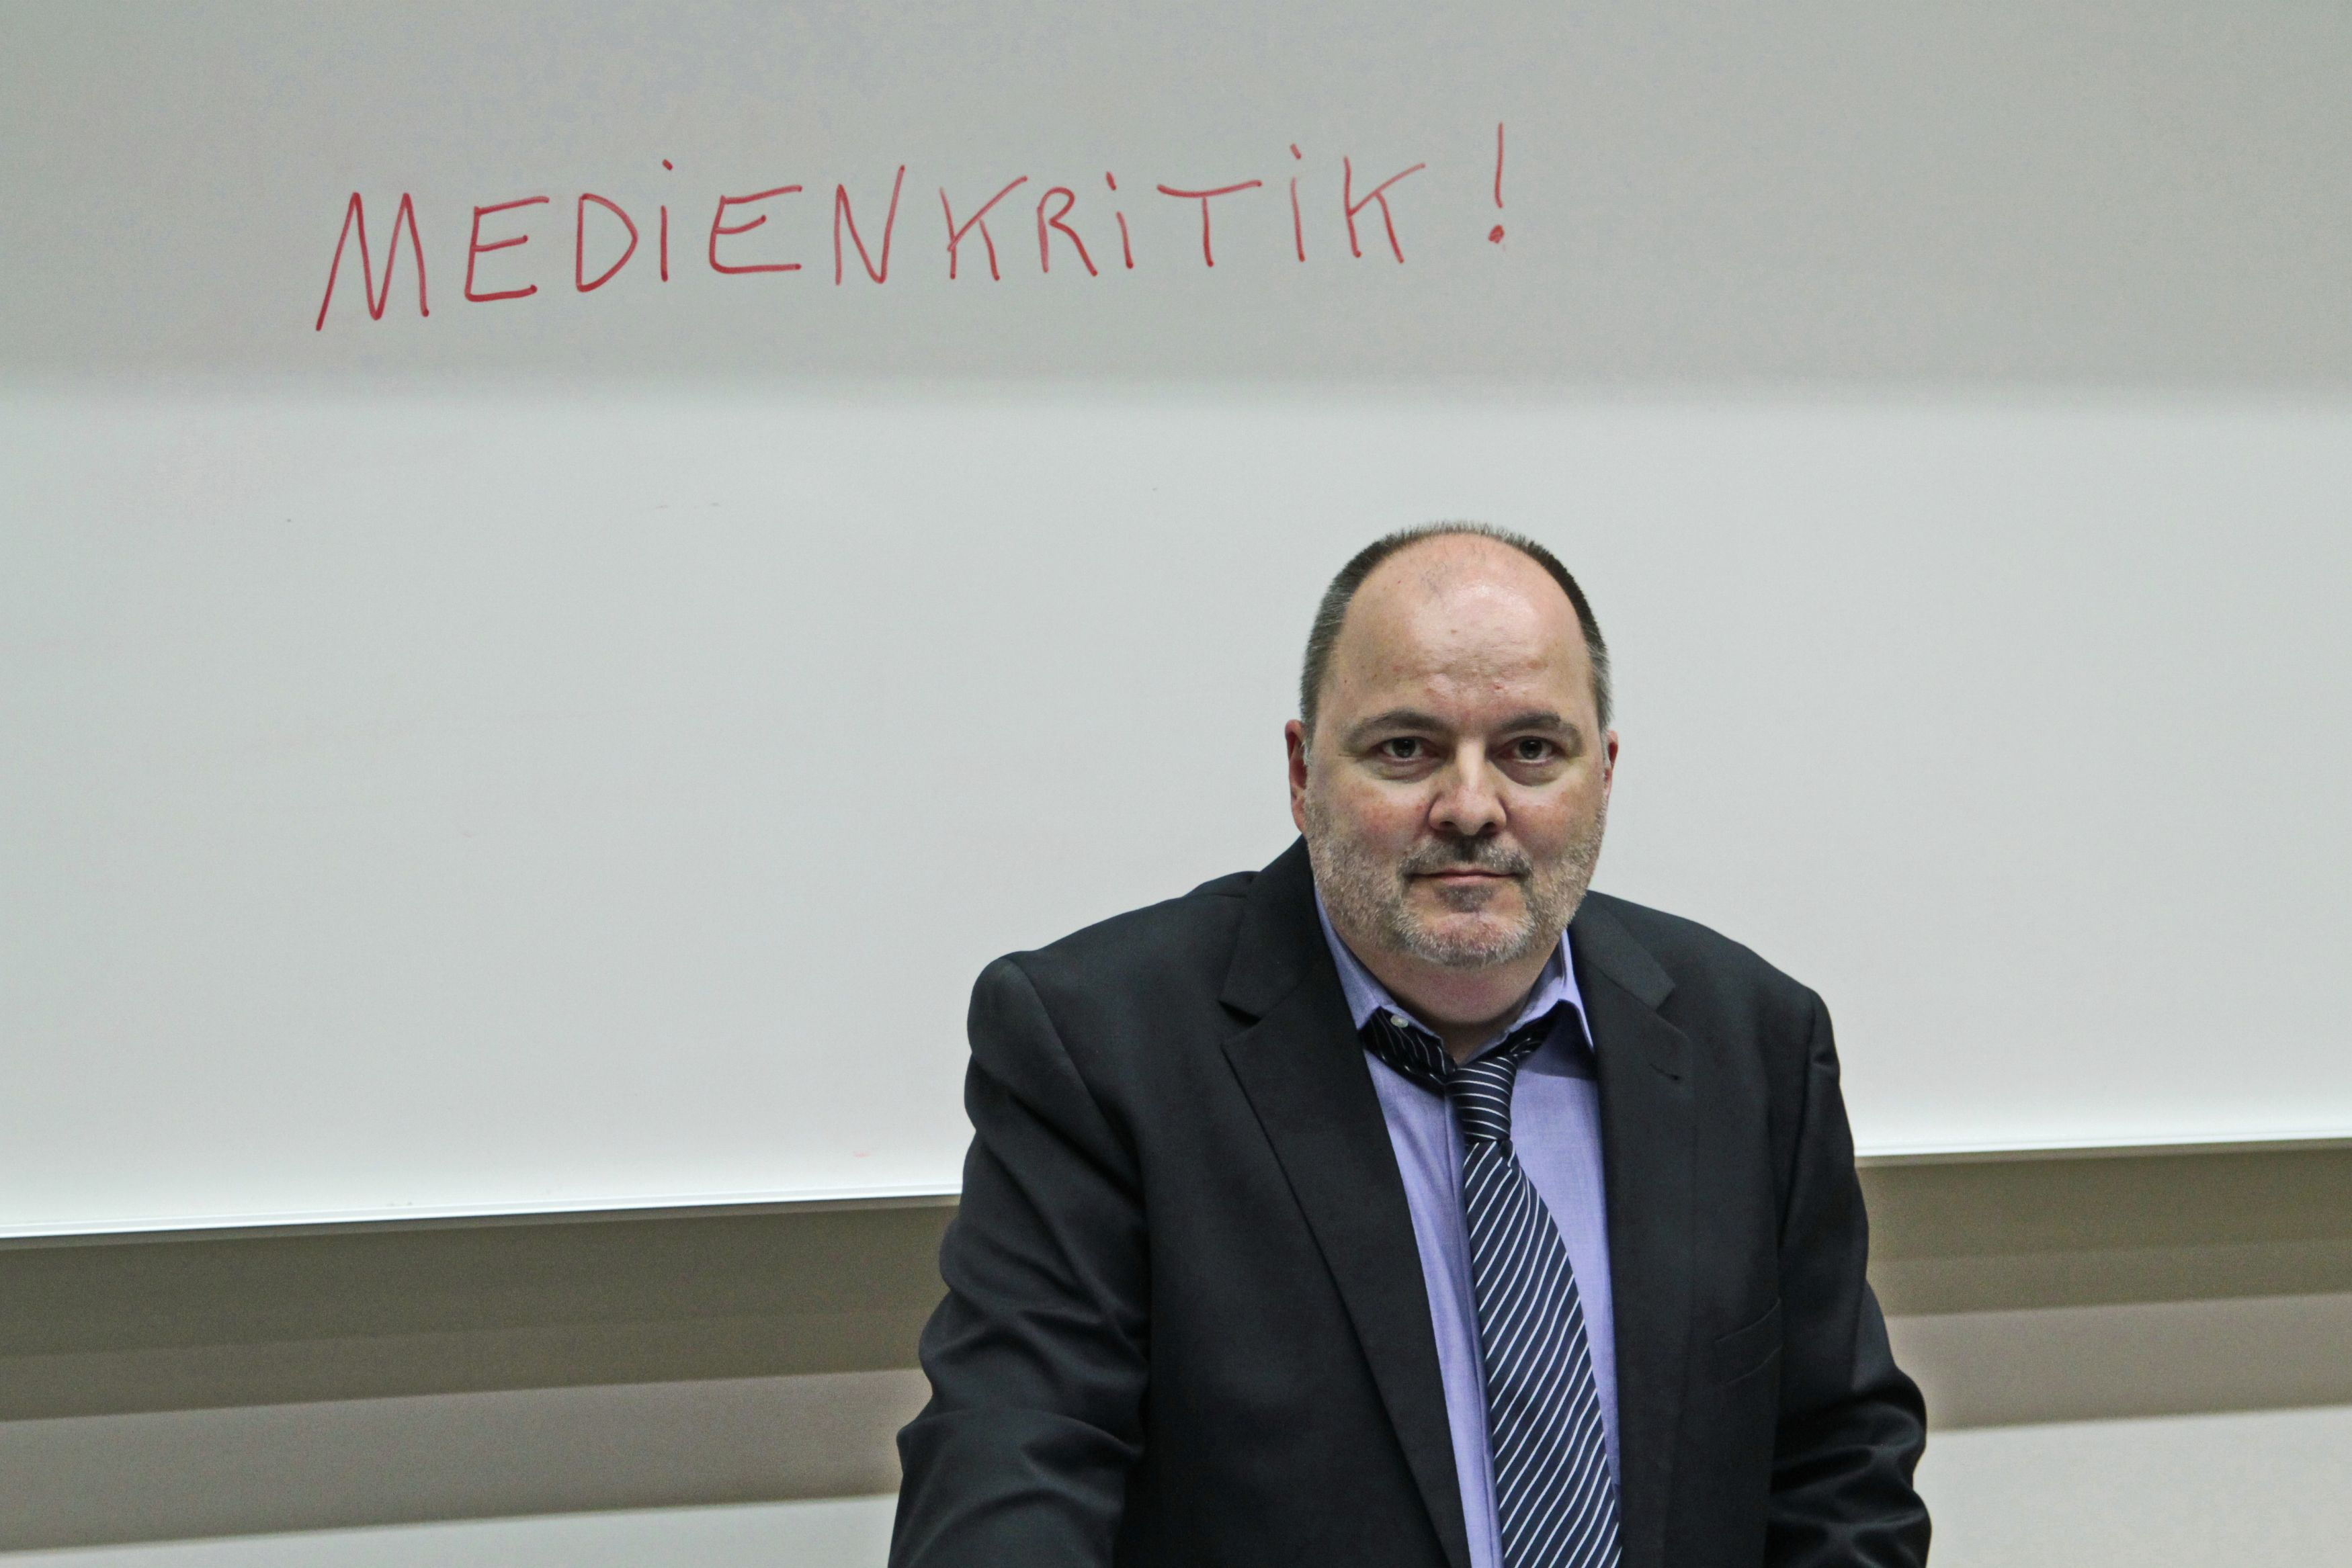 <p>Medienexperte Prof. Dr. Lutz Frühbrodt. Foto: Dietmar Modes.</p>